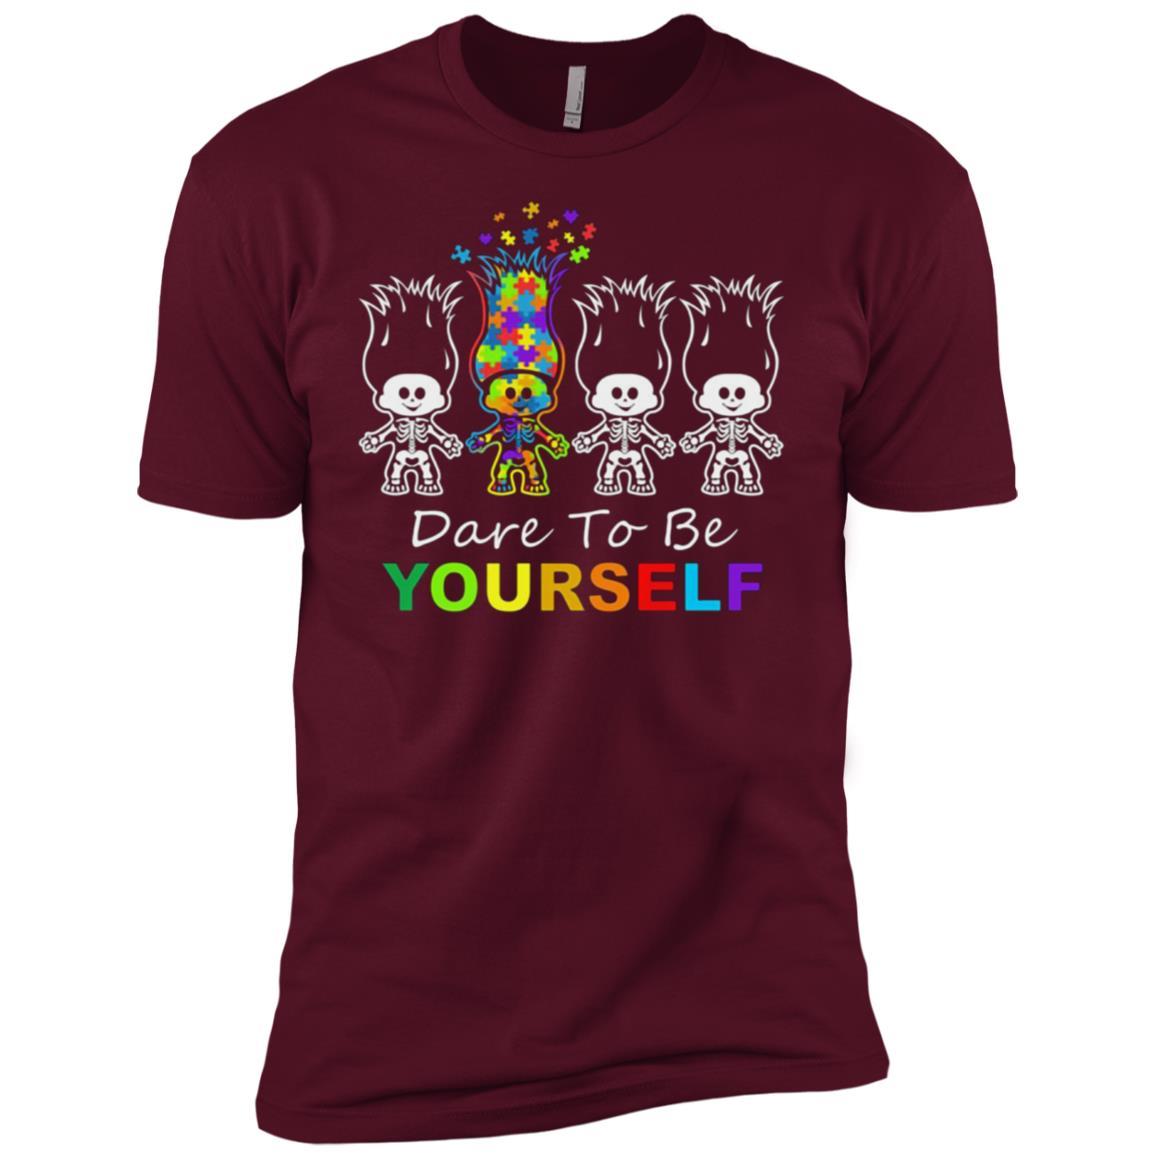 Autism Awareness Tee, Gift For Dad Men Short Sleeve T-Shirt